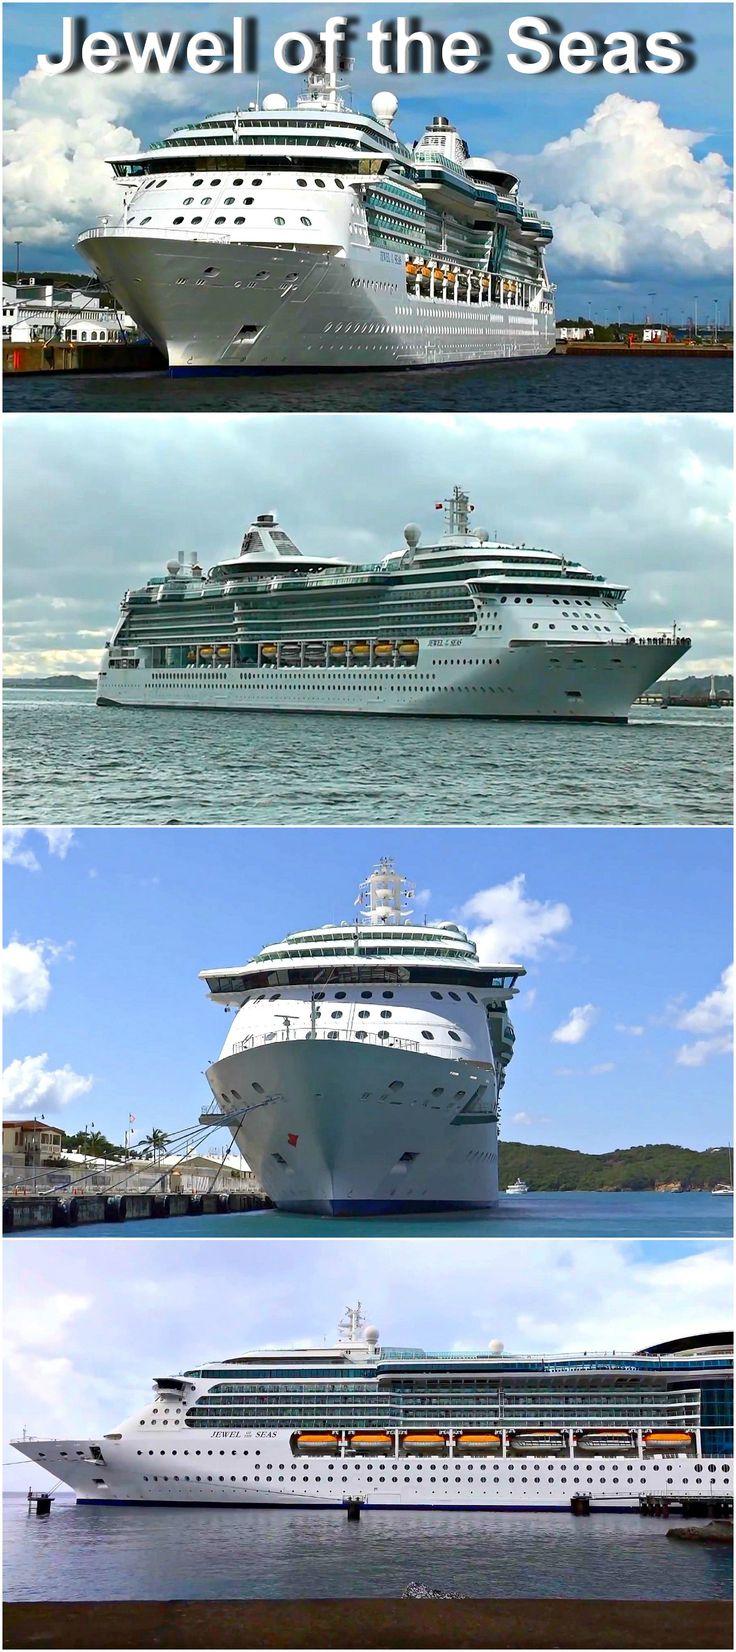 Royal Caribbean International: Jewel of the Seas Cruise ...